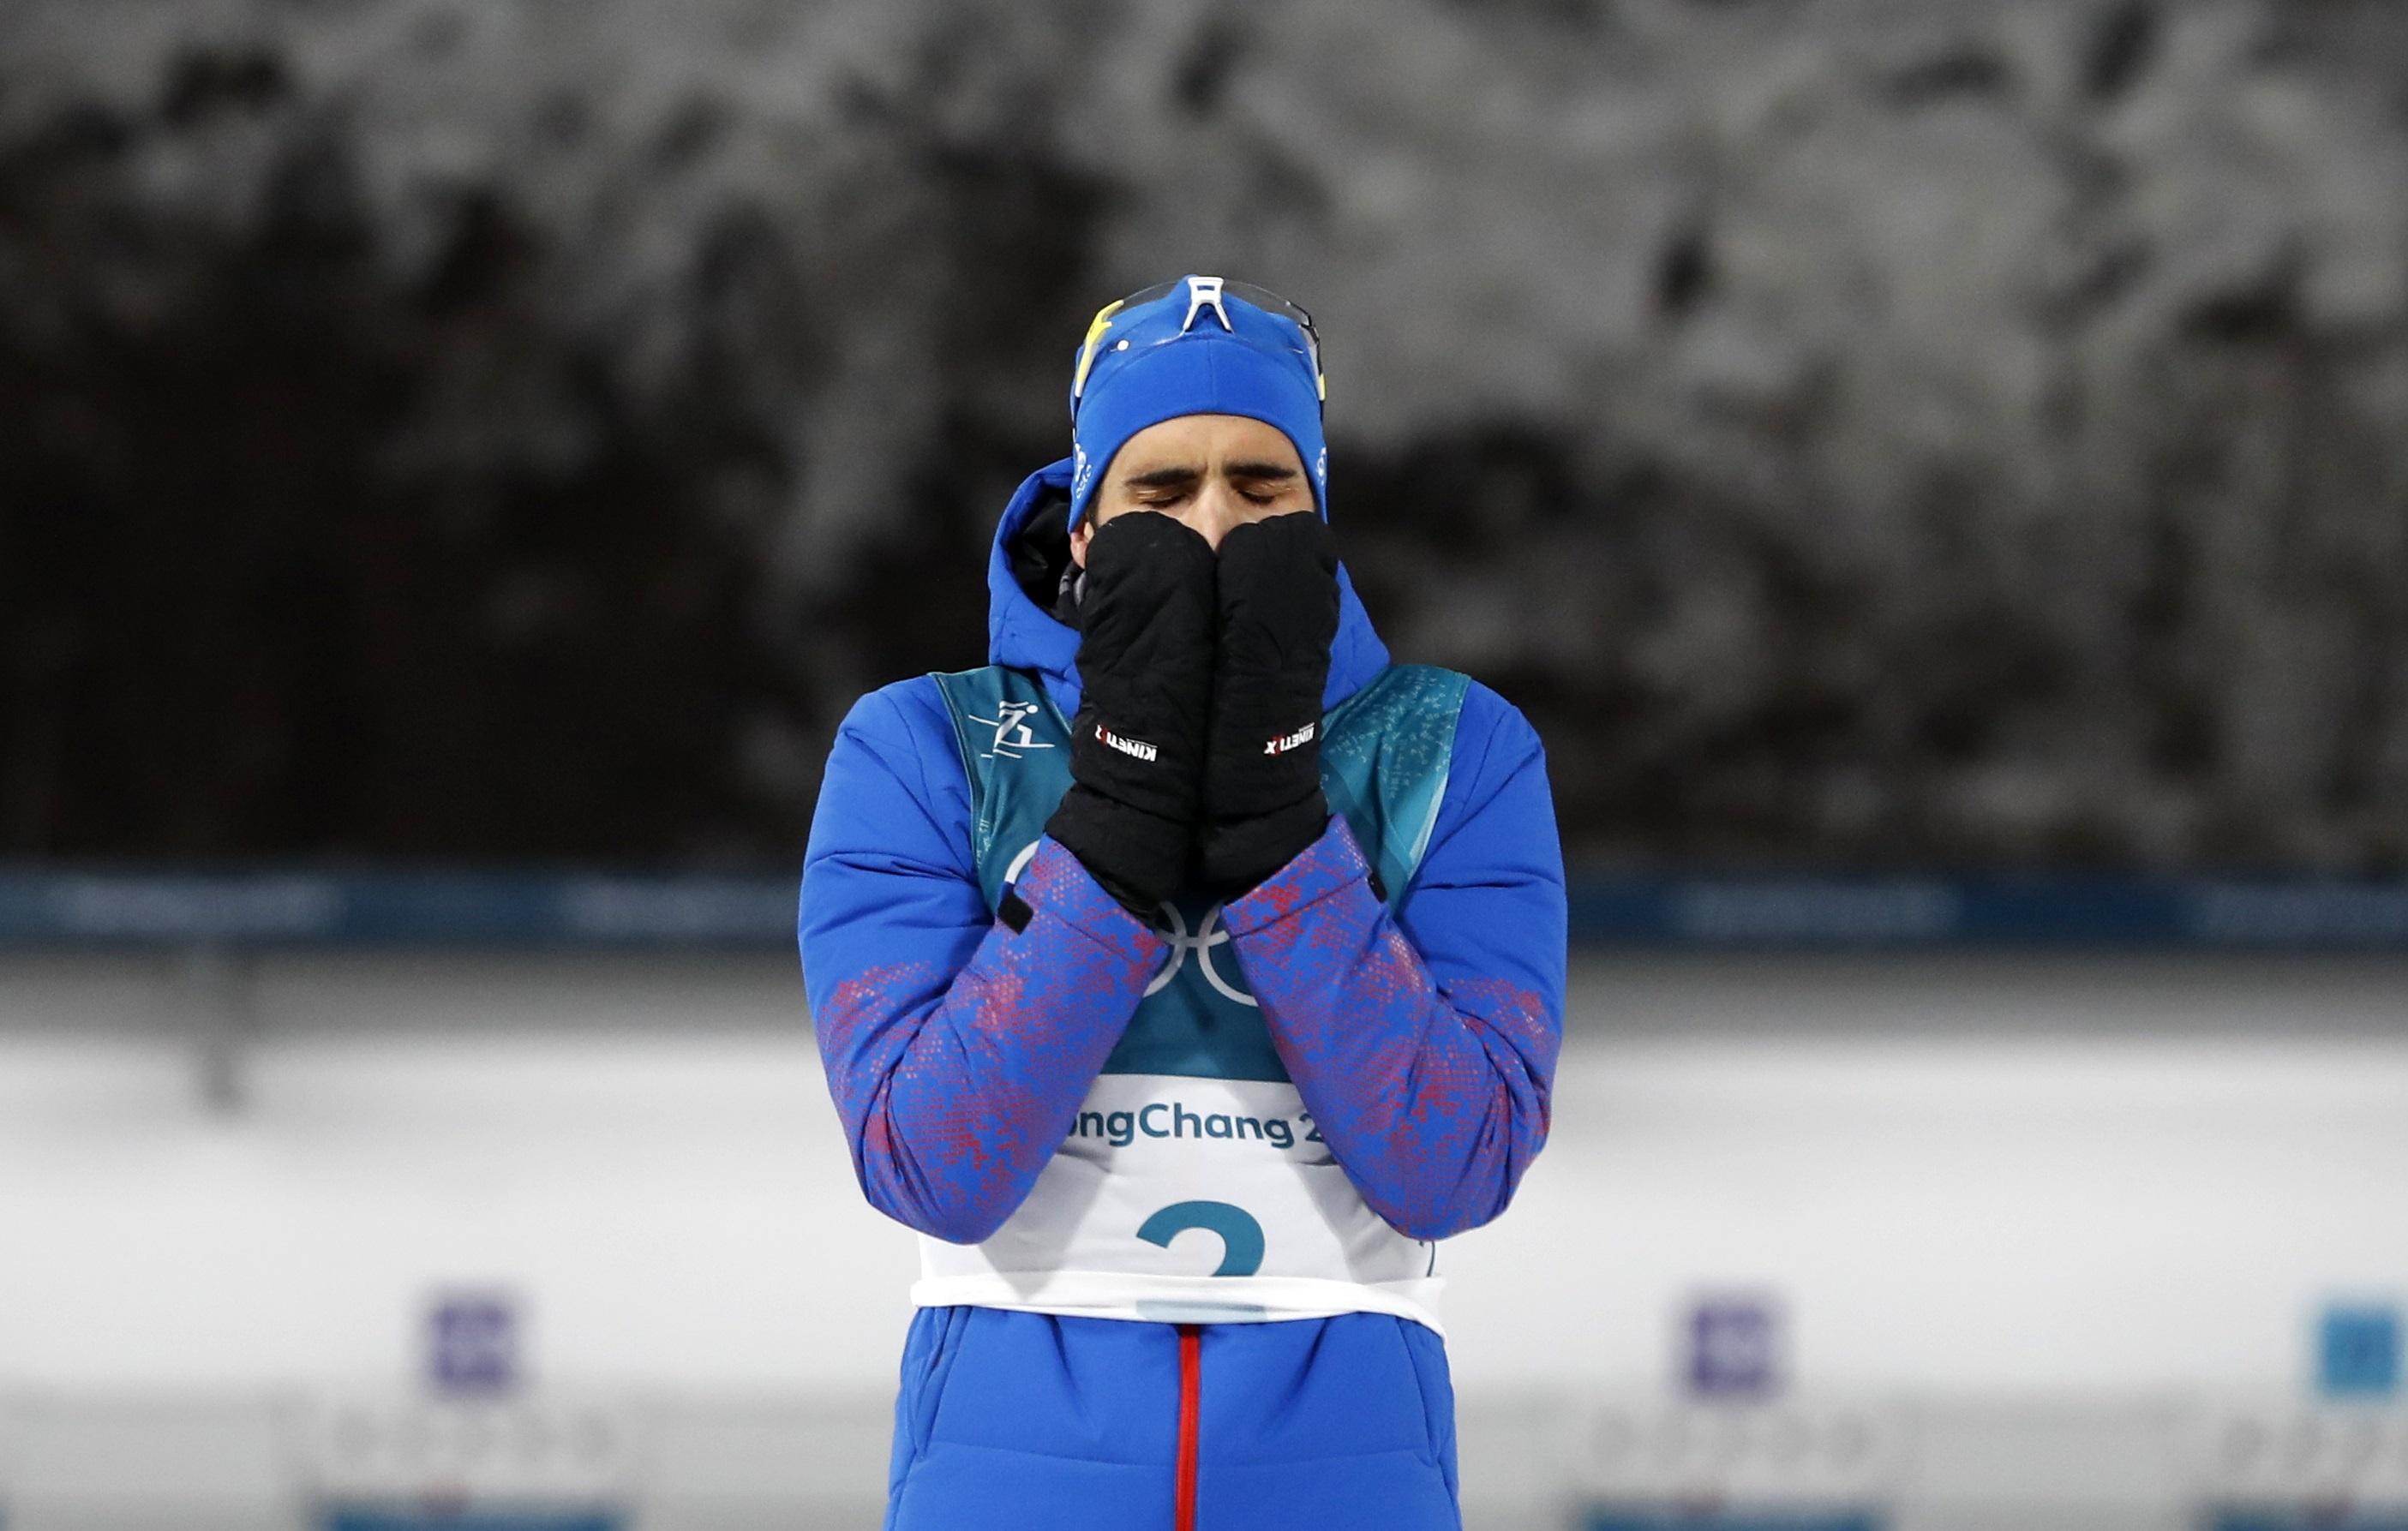 Jeux olympiques - Pyeongchang 2018 - Martin Fourcade : «J'ai tellement cru avoir perdu…»